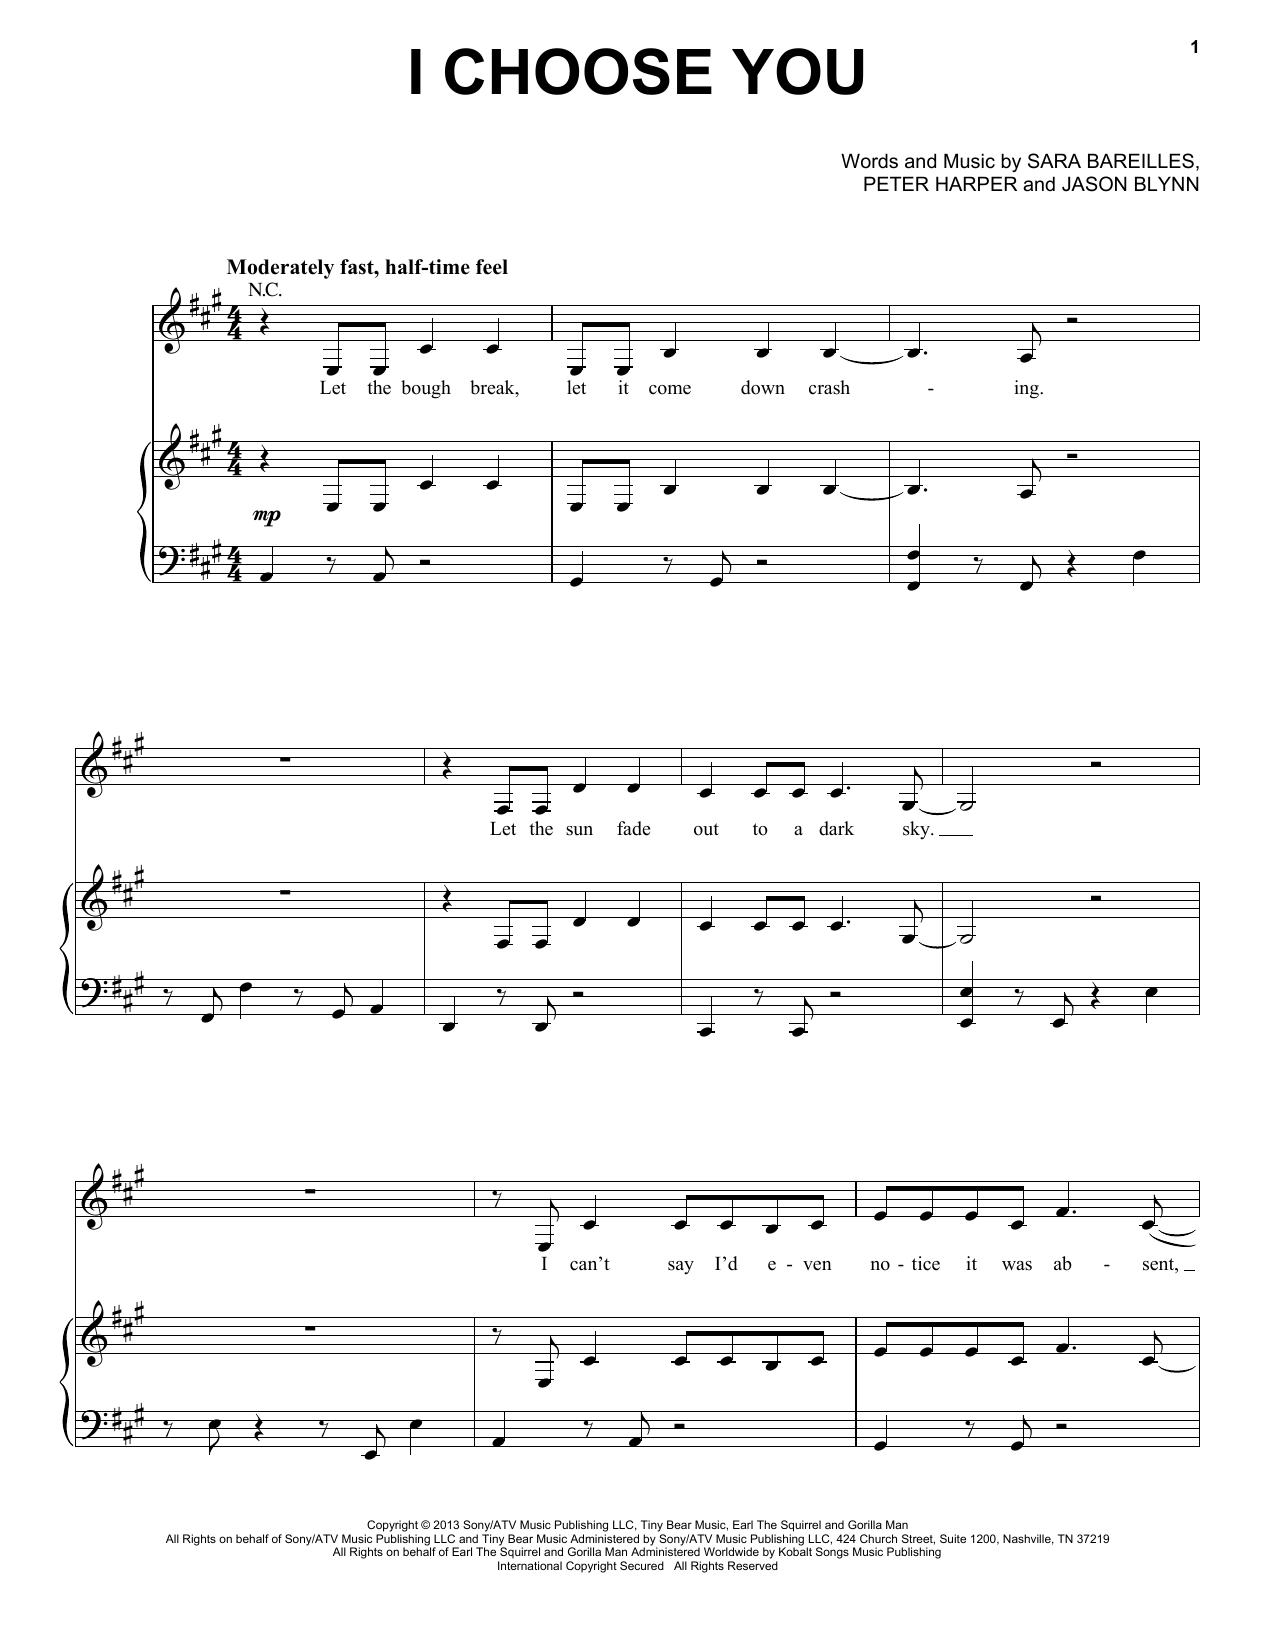 Sara Bareilles I Choose You sheet music notes and chords. Download Printable PDF.